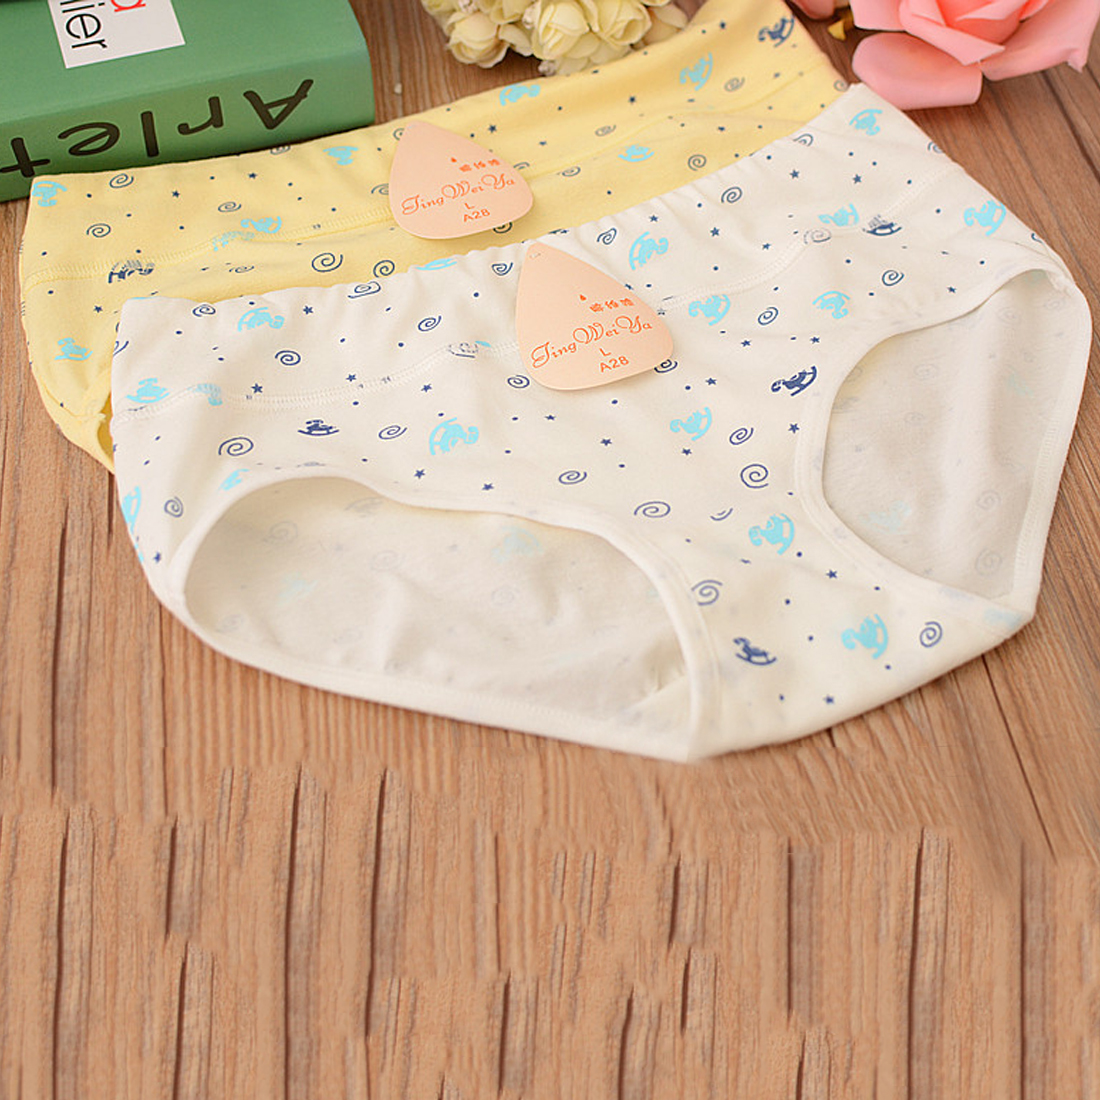 Buy Top Quality Women's Cotton Briefs Underpants Sexy Lingerie Underwear Knicker Panties